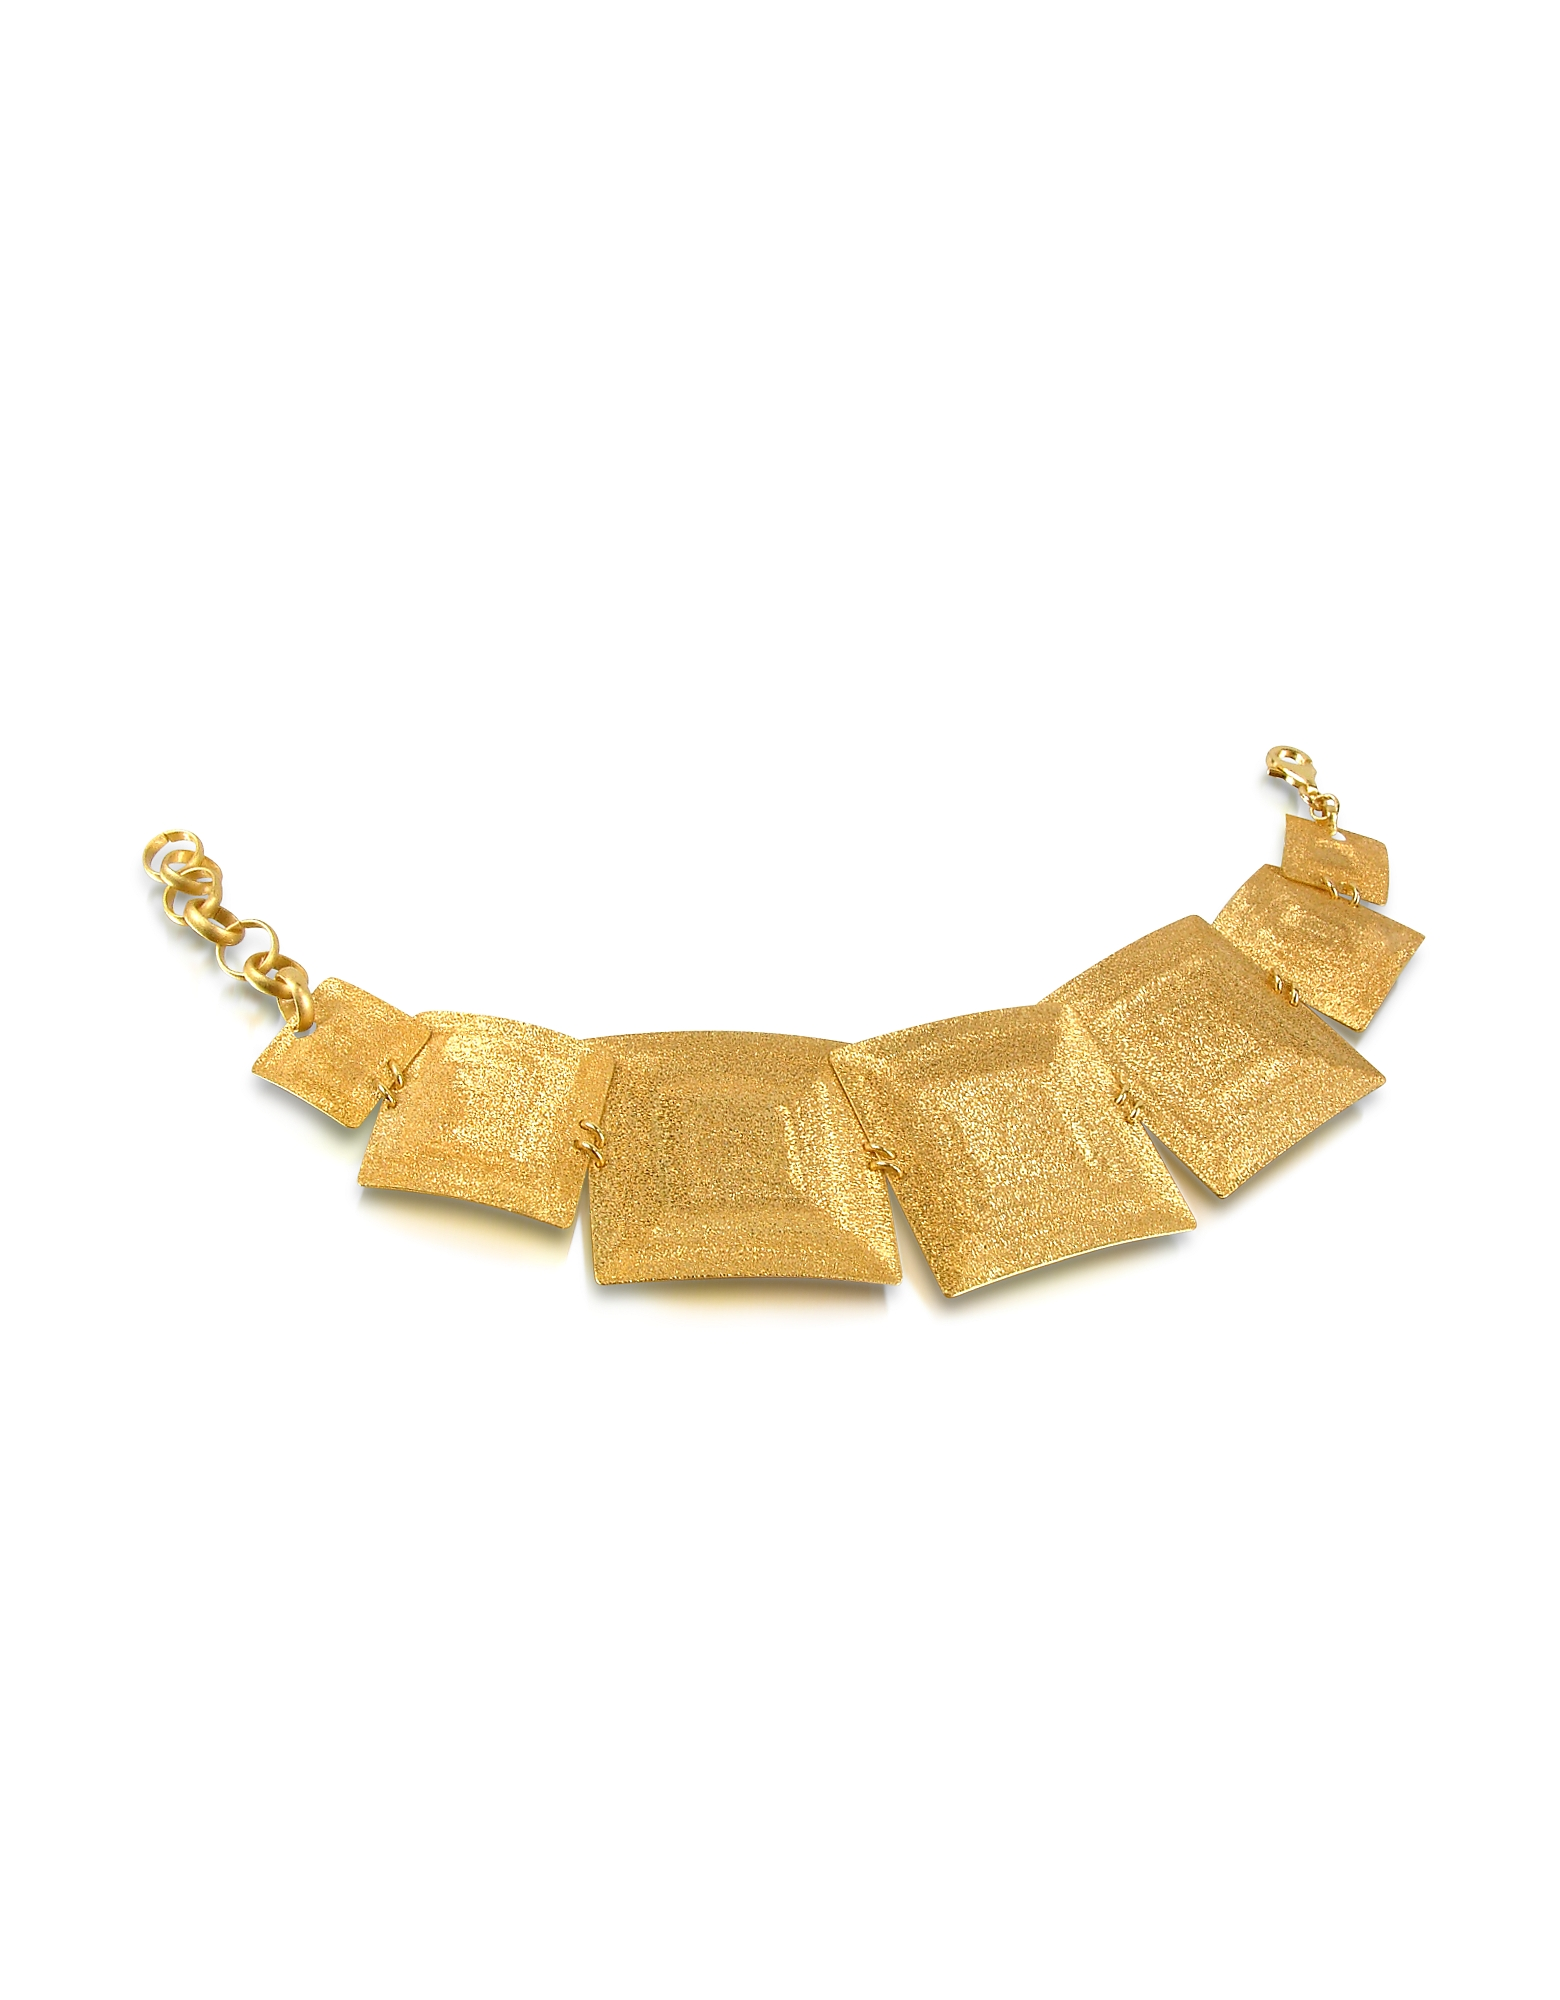 Stefano Patriarchi Bracelets, Golden Silver Etched Square Link Bracelet